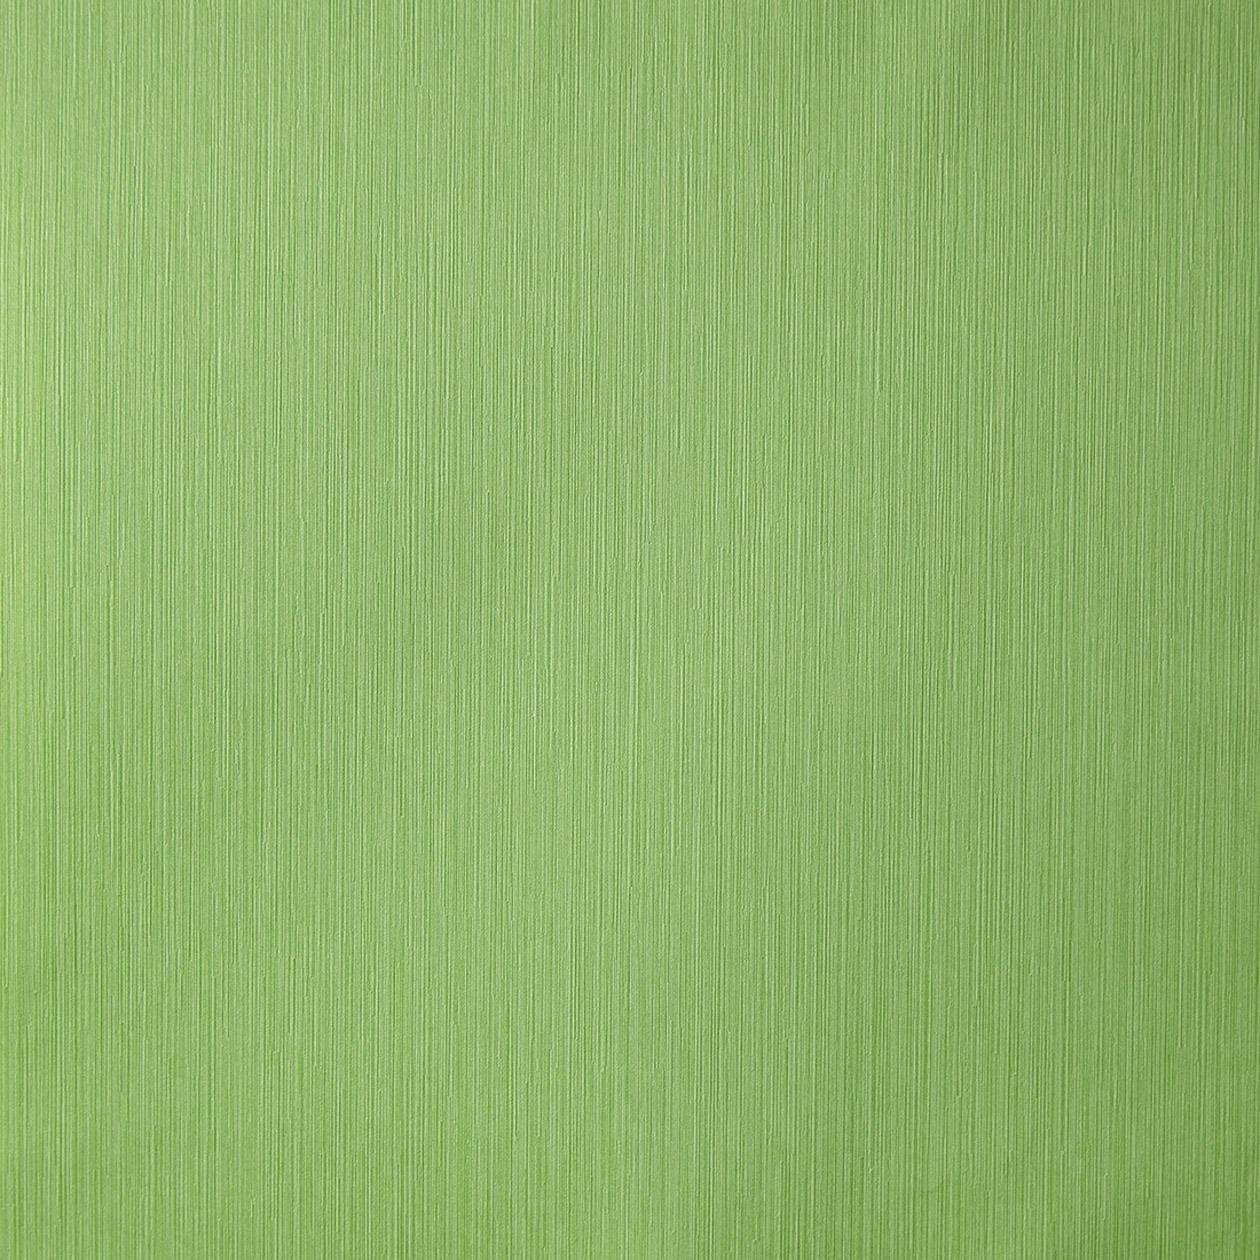 Французские обои Caselio,  коллекция Amazonia, артикулAMZ66497270